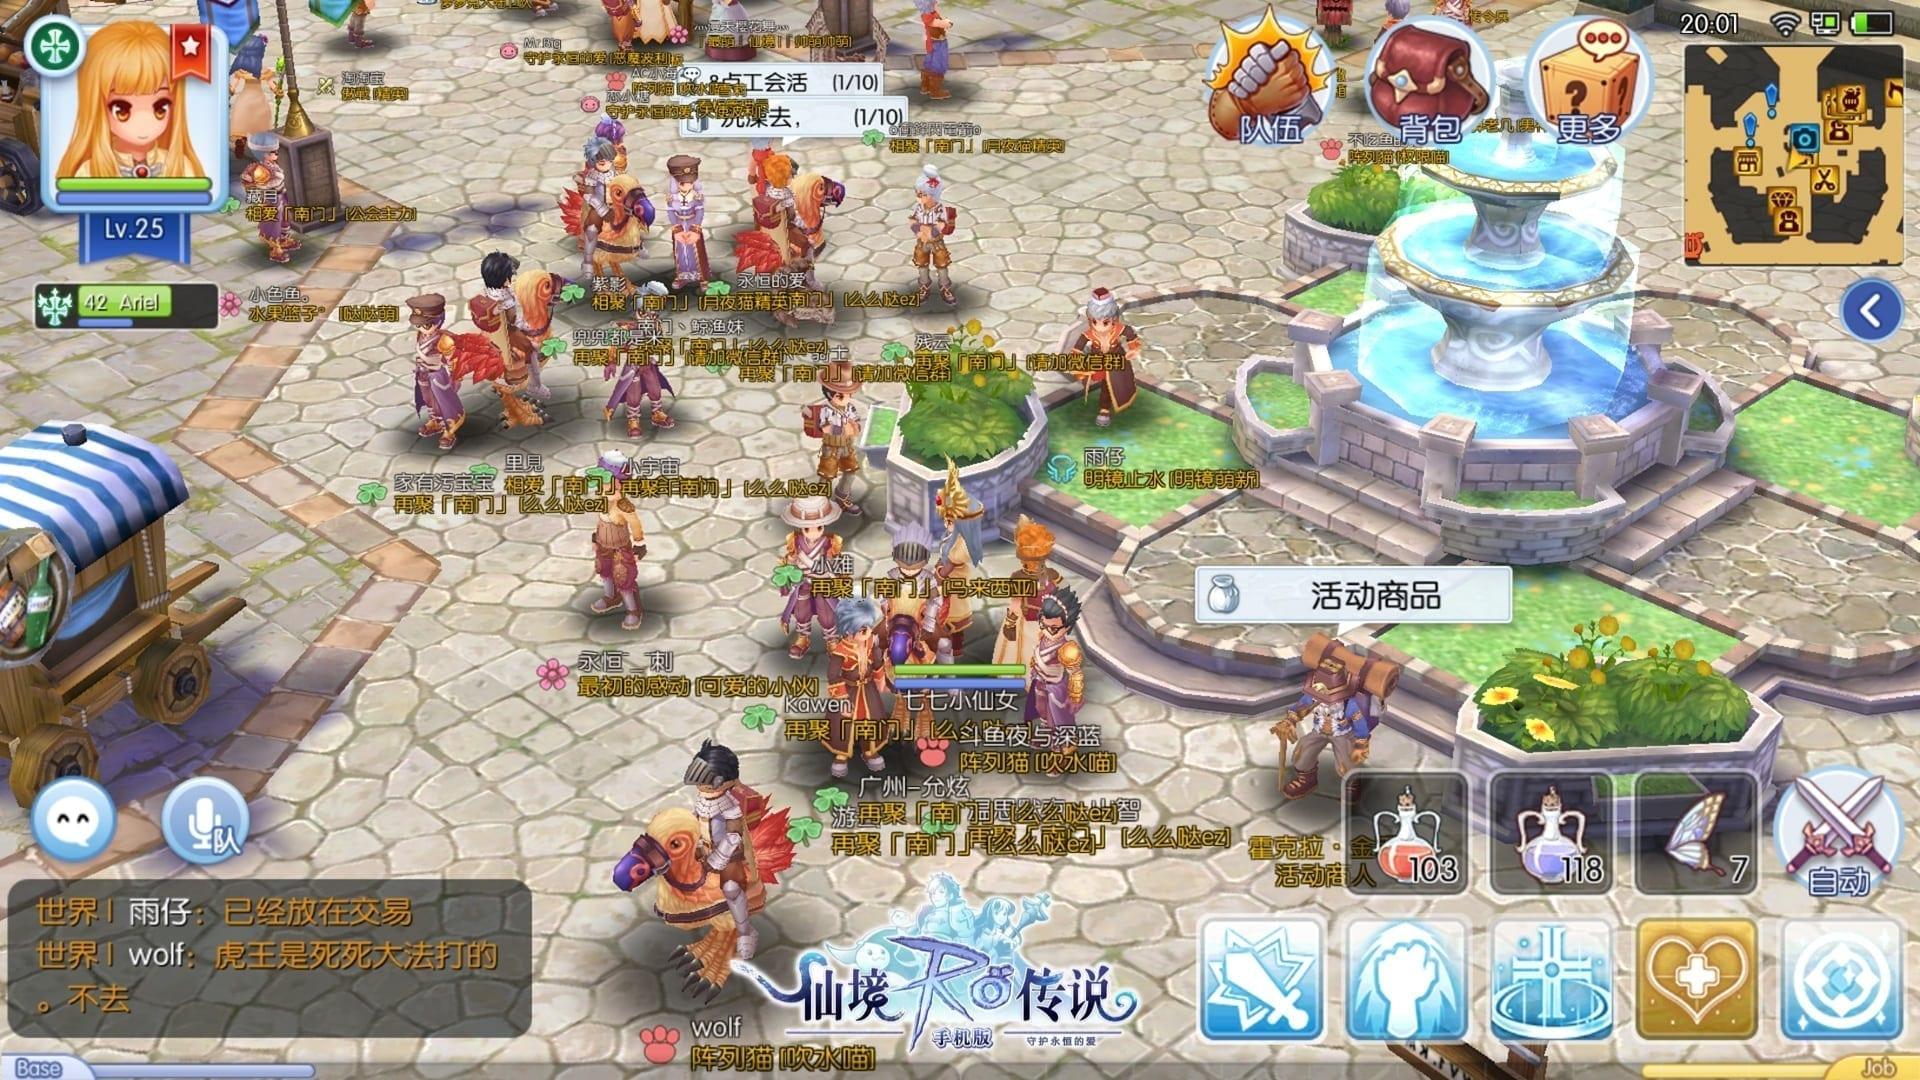 ragnarok-mobile-screenshot-1